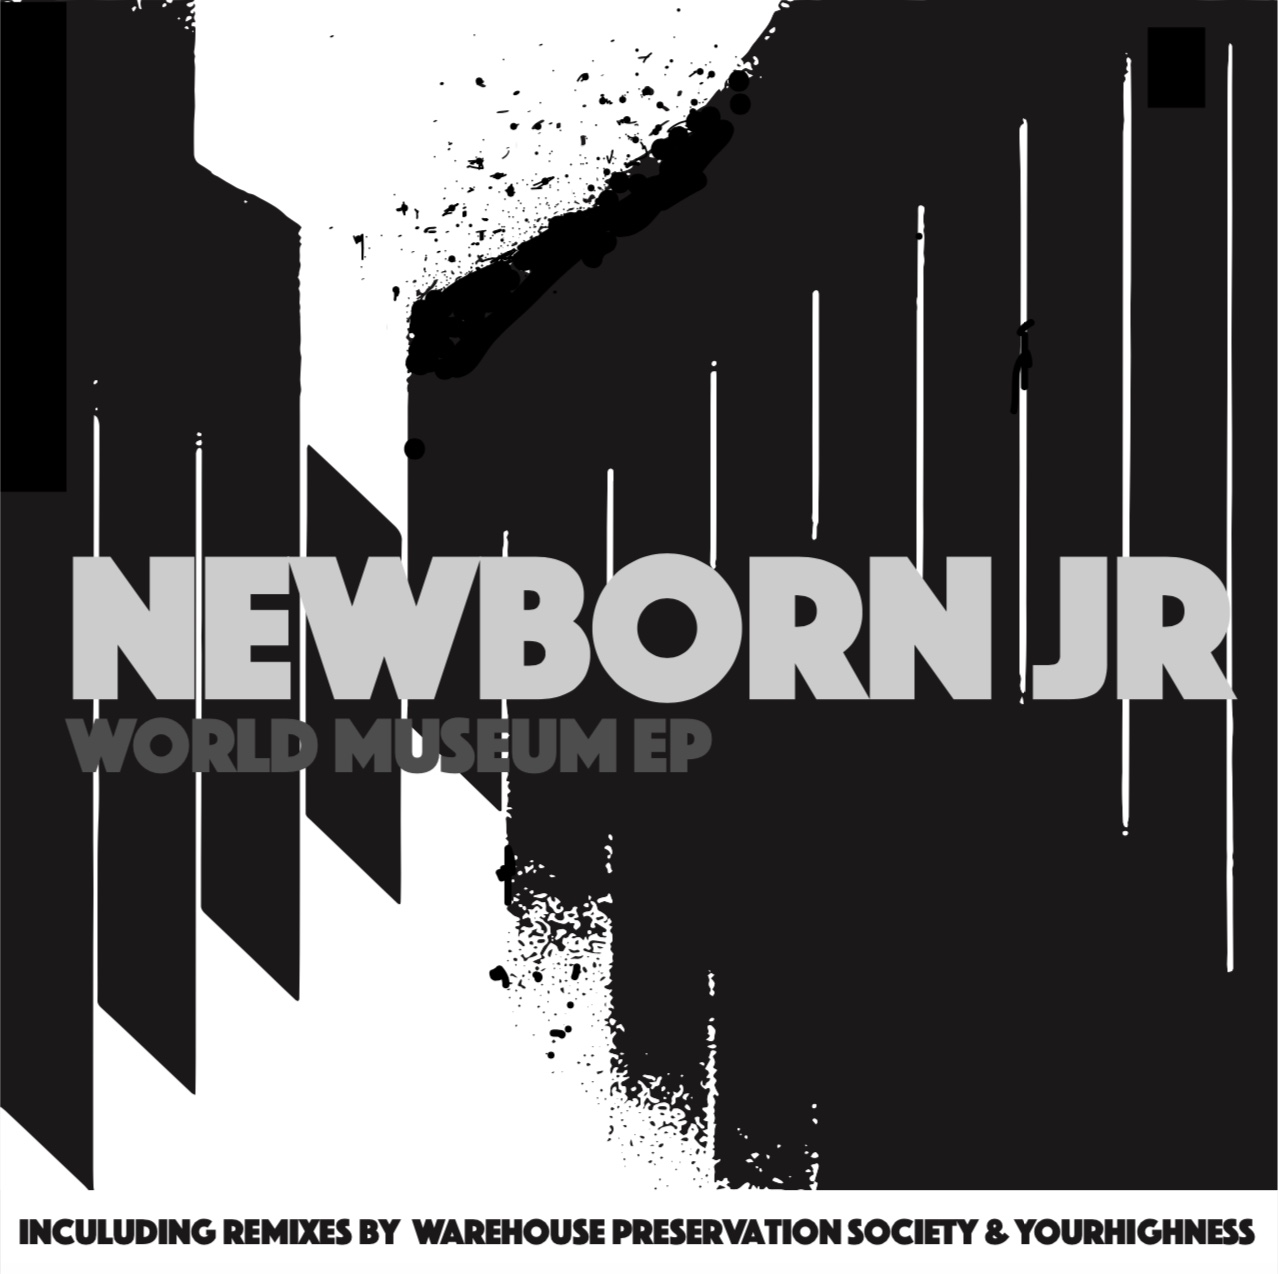 World Museum EP / Newborn JR